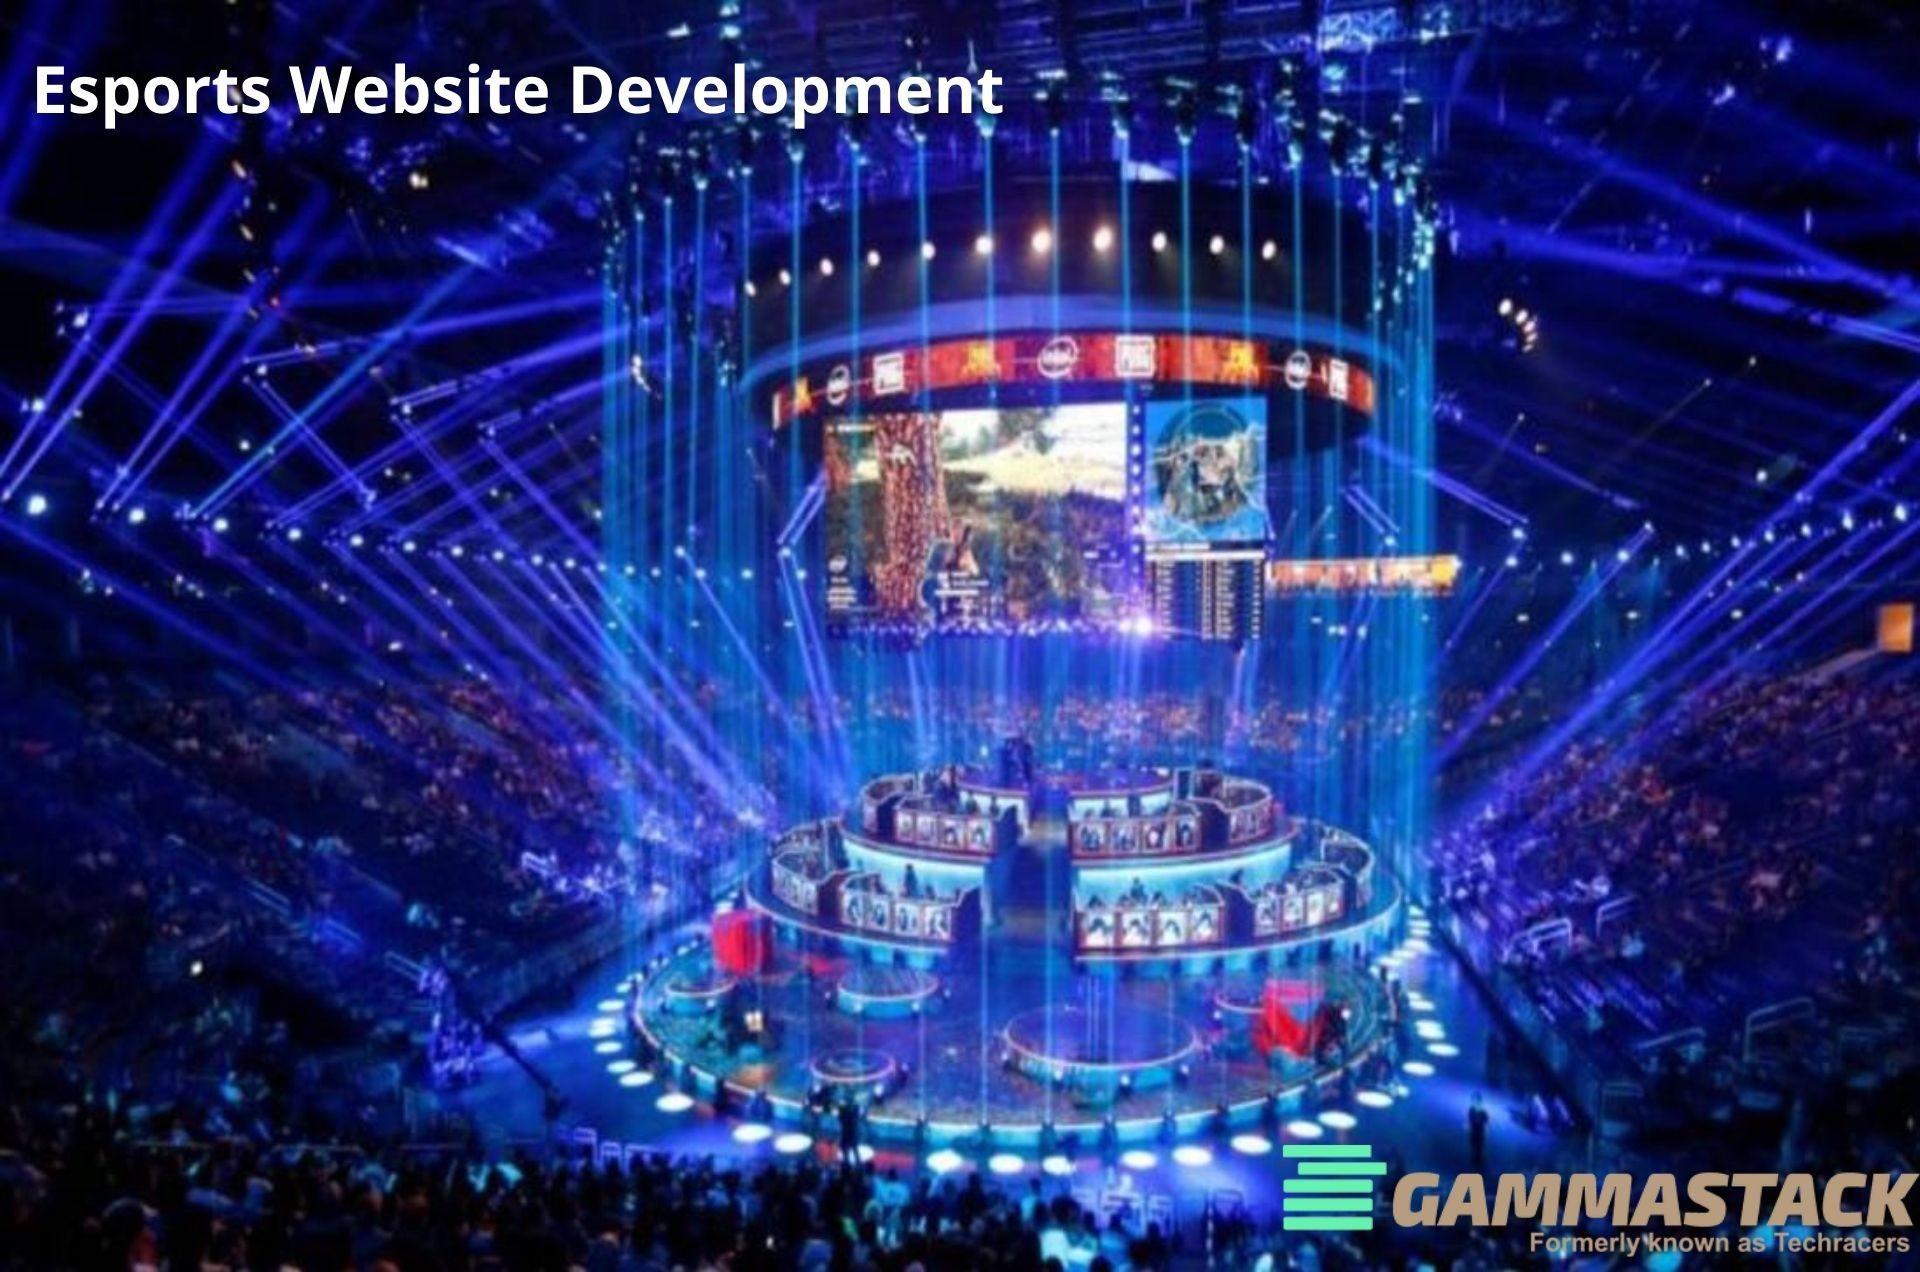 Esports Website Development